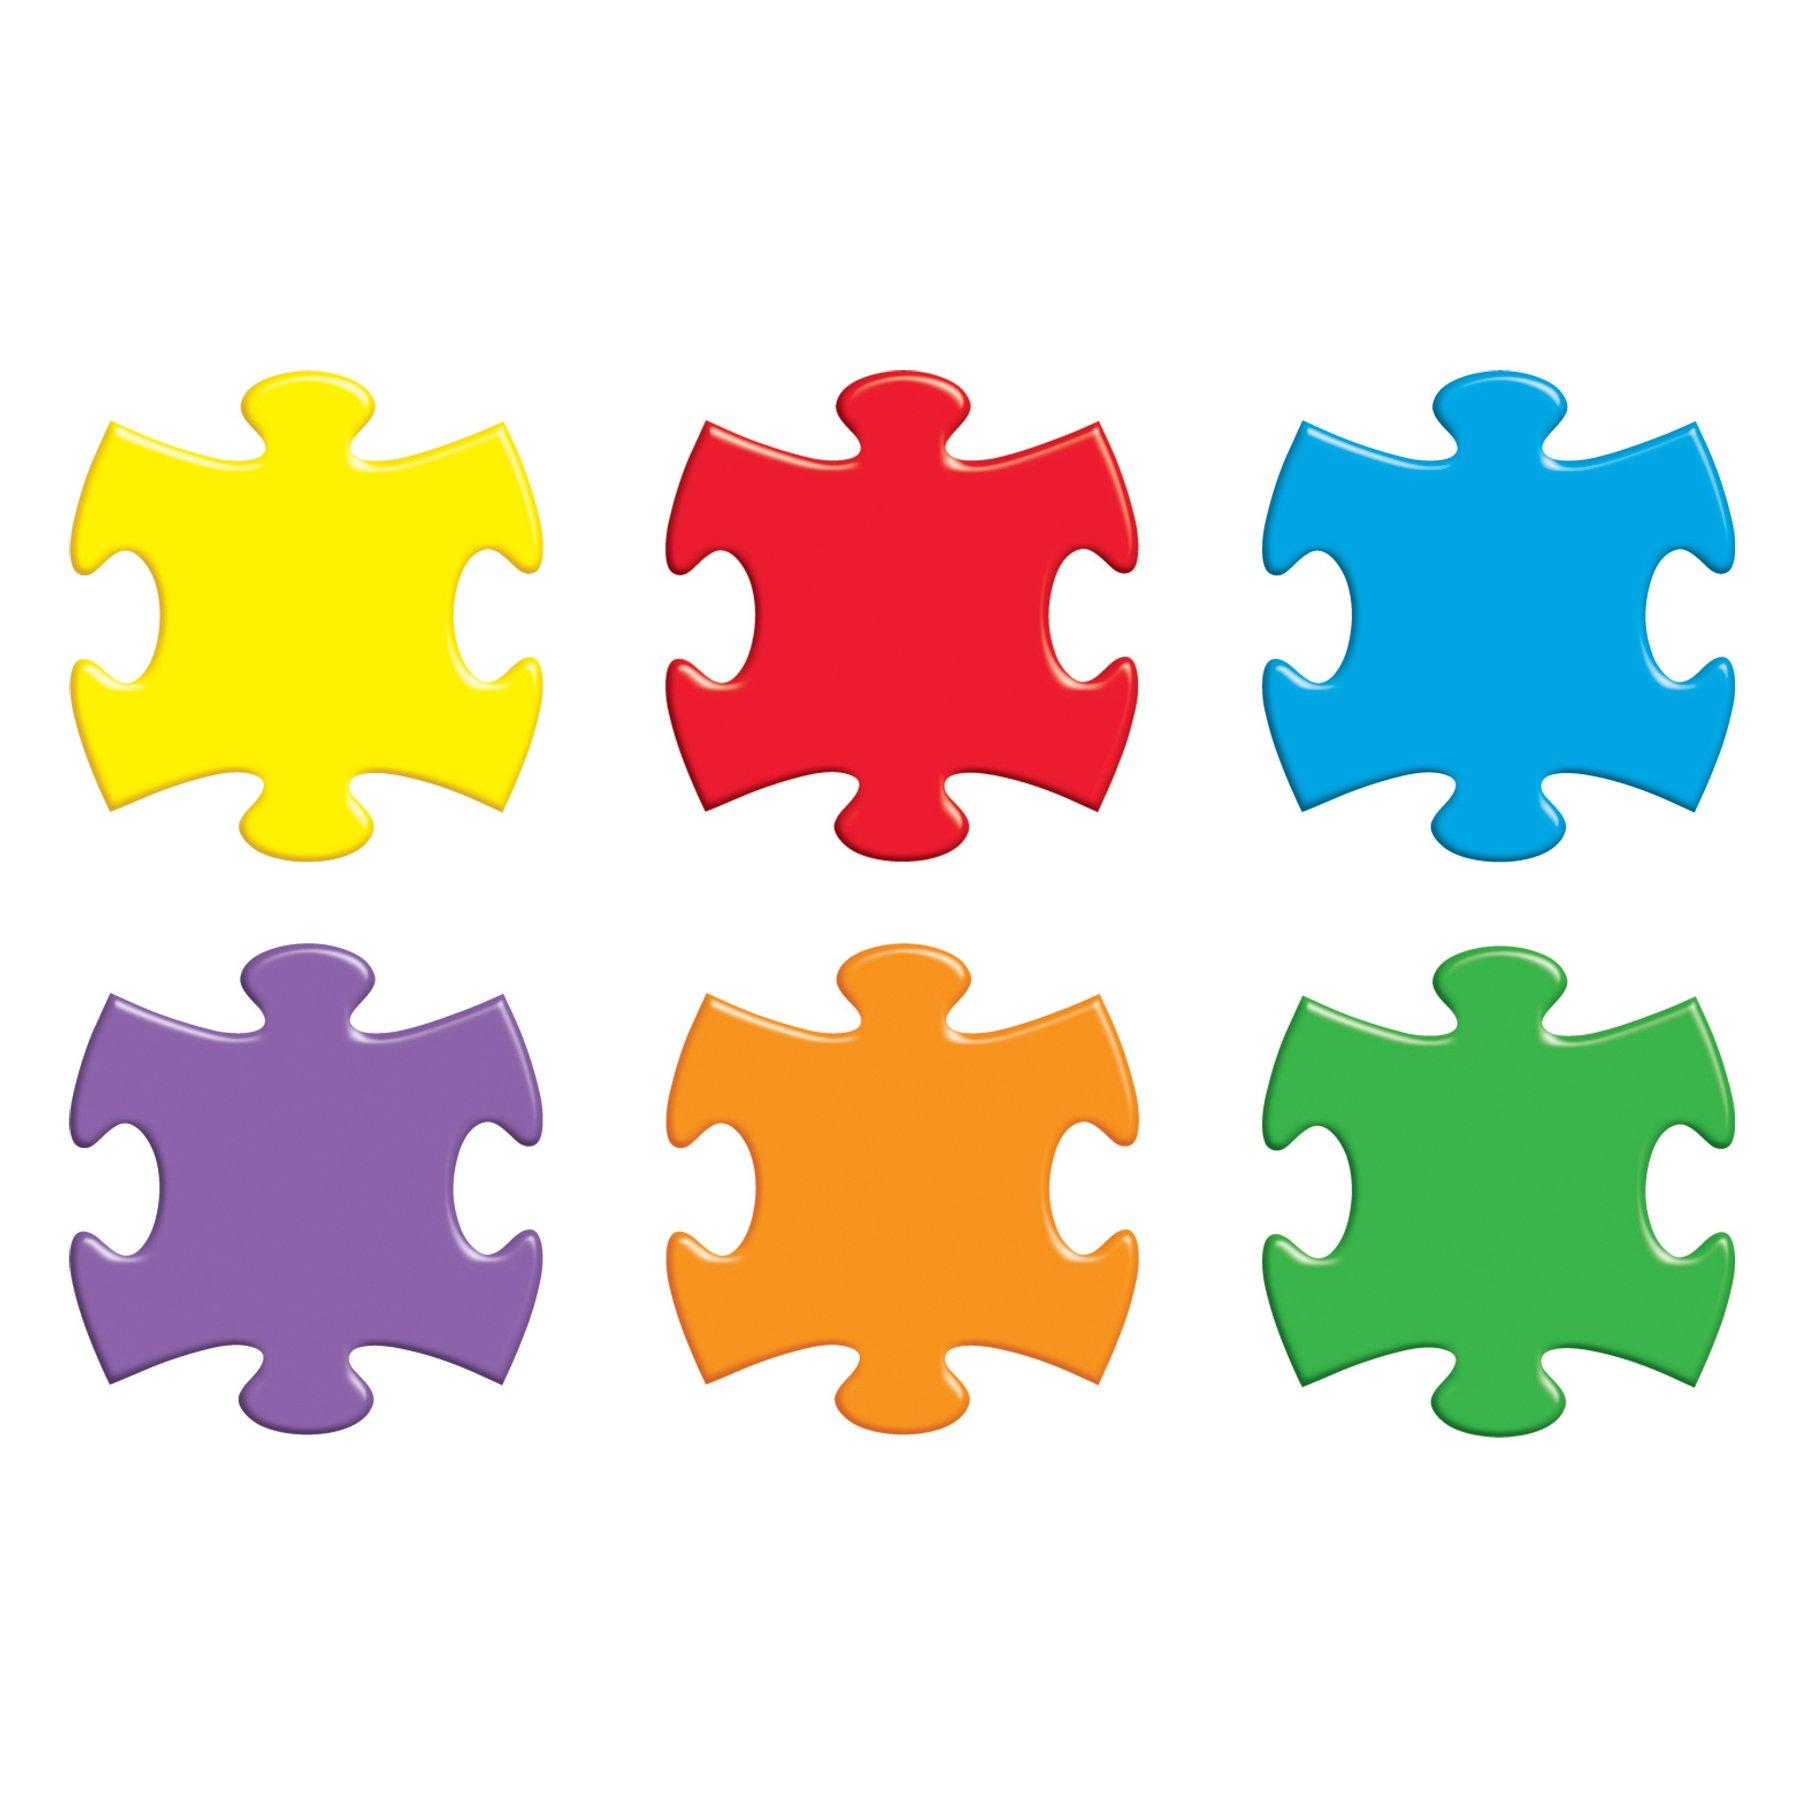 TREND enterprises, Inc. T-10906BN Puzzle Pieces Classic Accents Variety Pack, 36 Per Pack, 6 Packs by TREND Enterprises